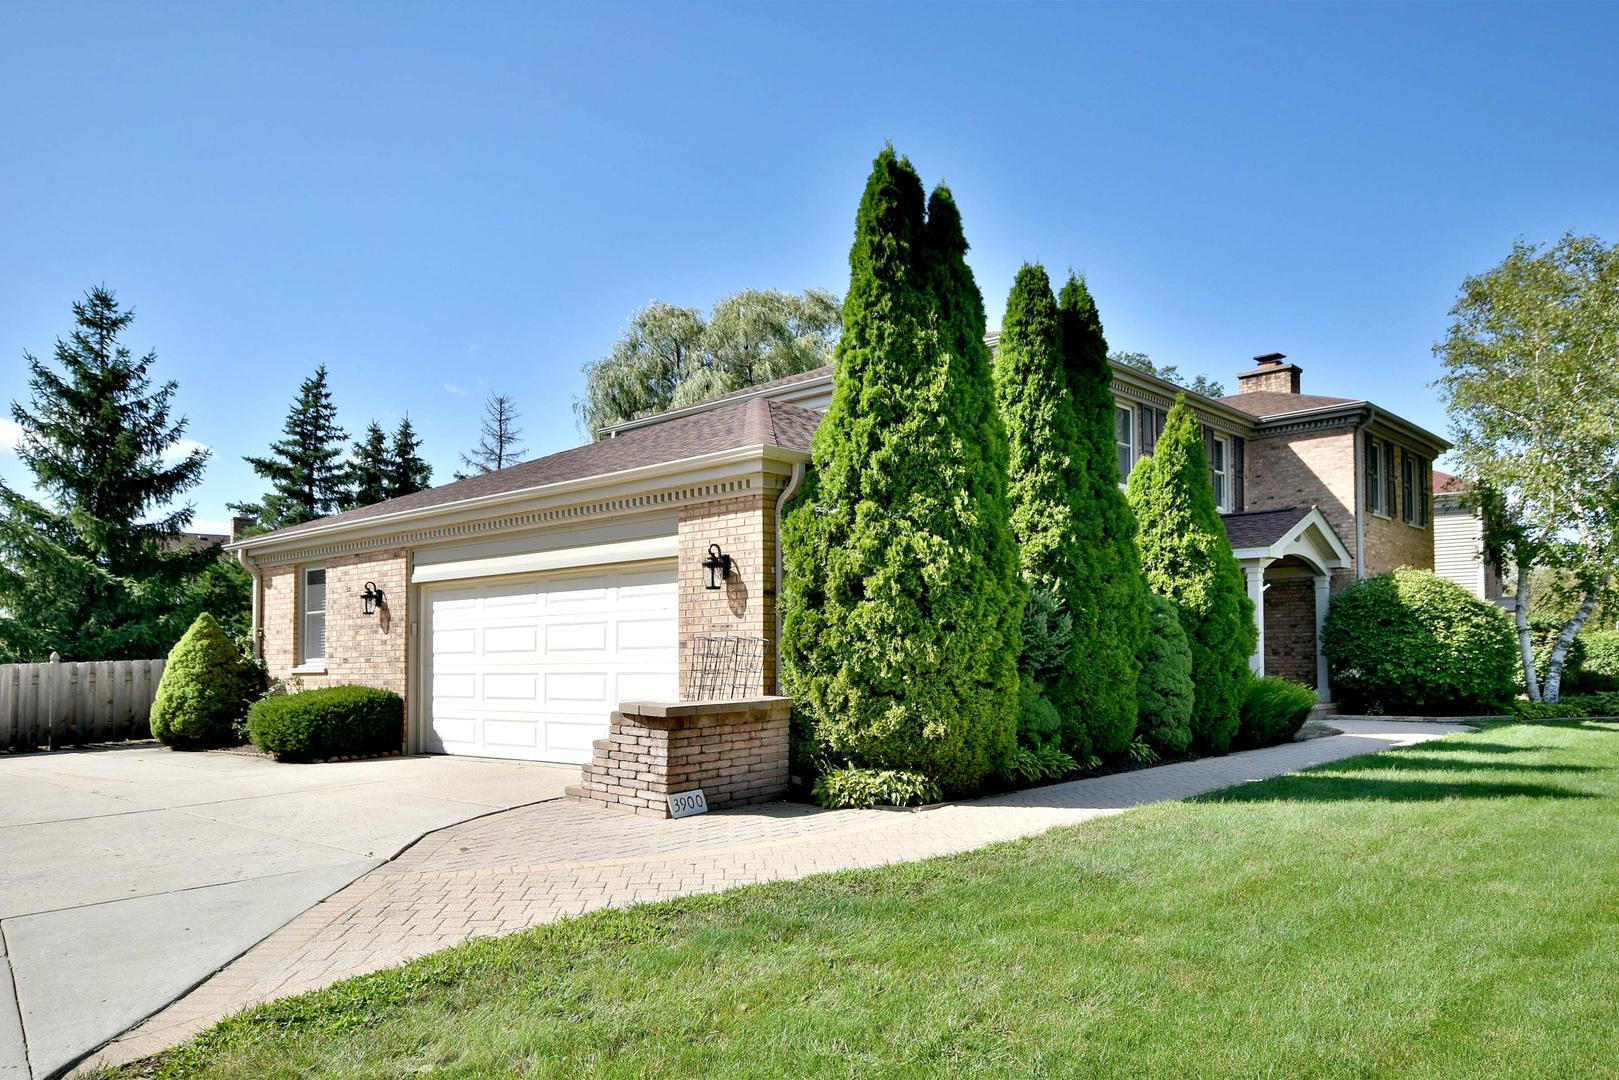 3900 Bordeaux, Hoffman Estates, Illinois, 60192